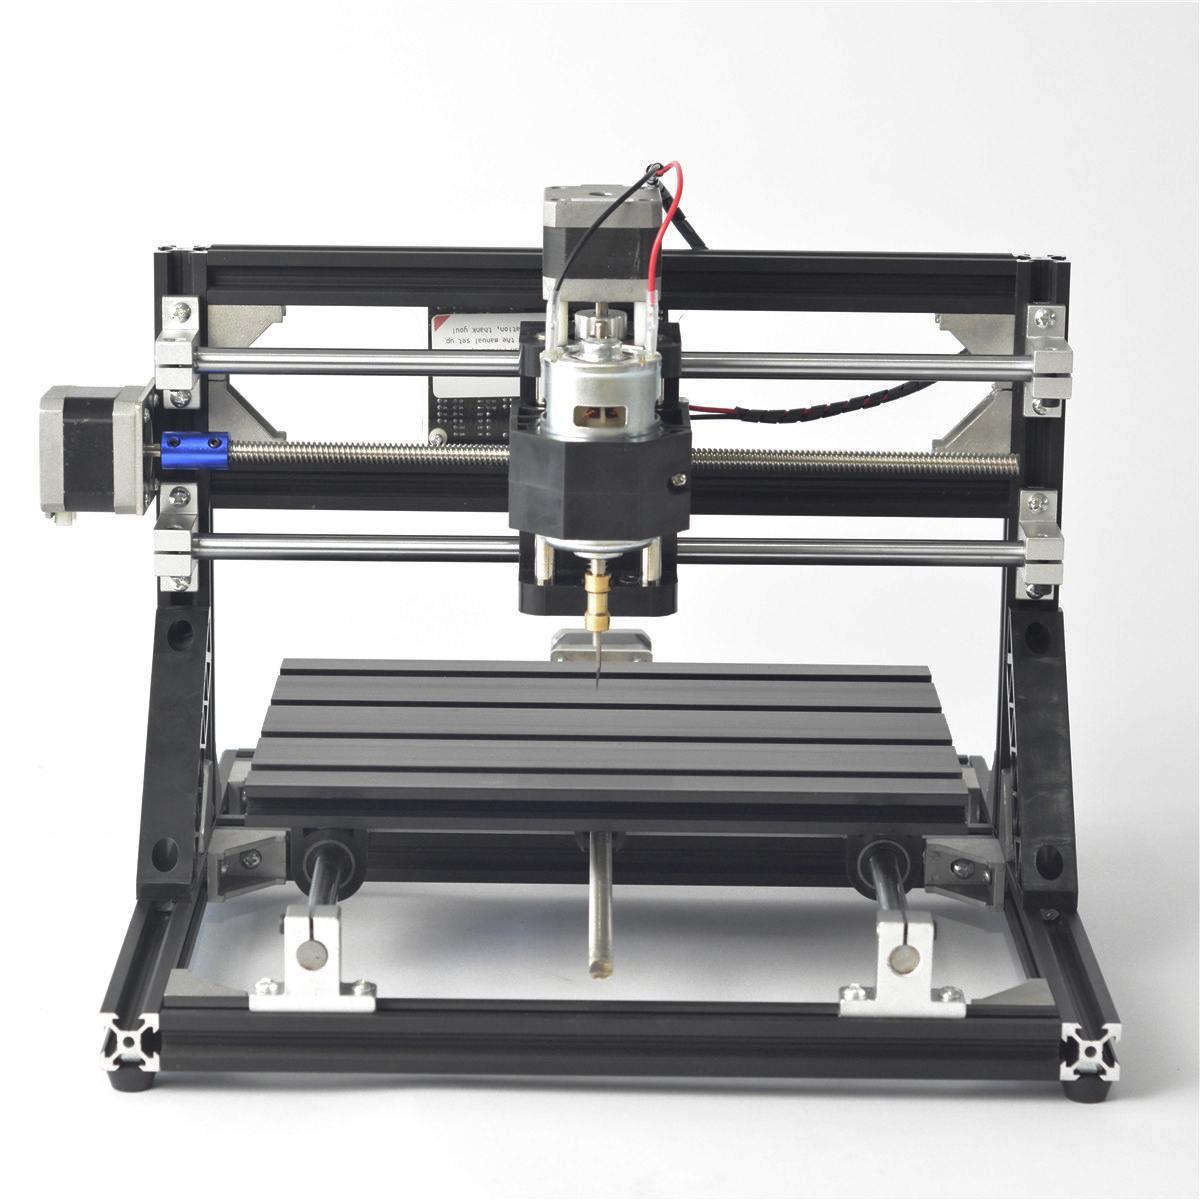 cnc 2418,cnc engraving machine,Pcb Milling Machine,Wood Carving machine,mini cnc router,cnc2418, best Advanced toyscnc 2418,cnc engraving machine,Pcb Milling Machine,Wood Carving machine,mini cnc router,cnc2418, best Advanced toys